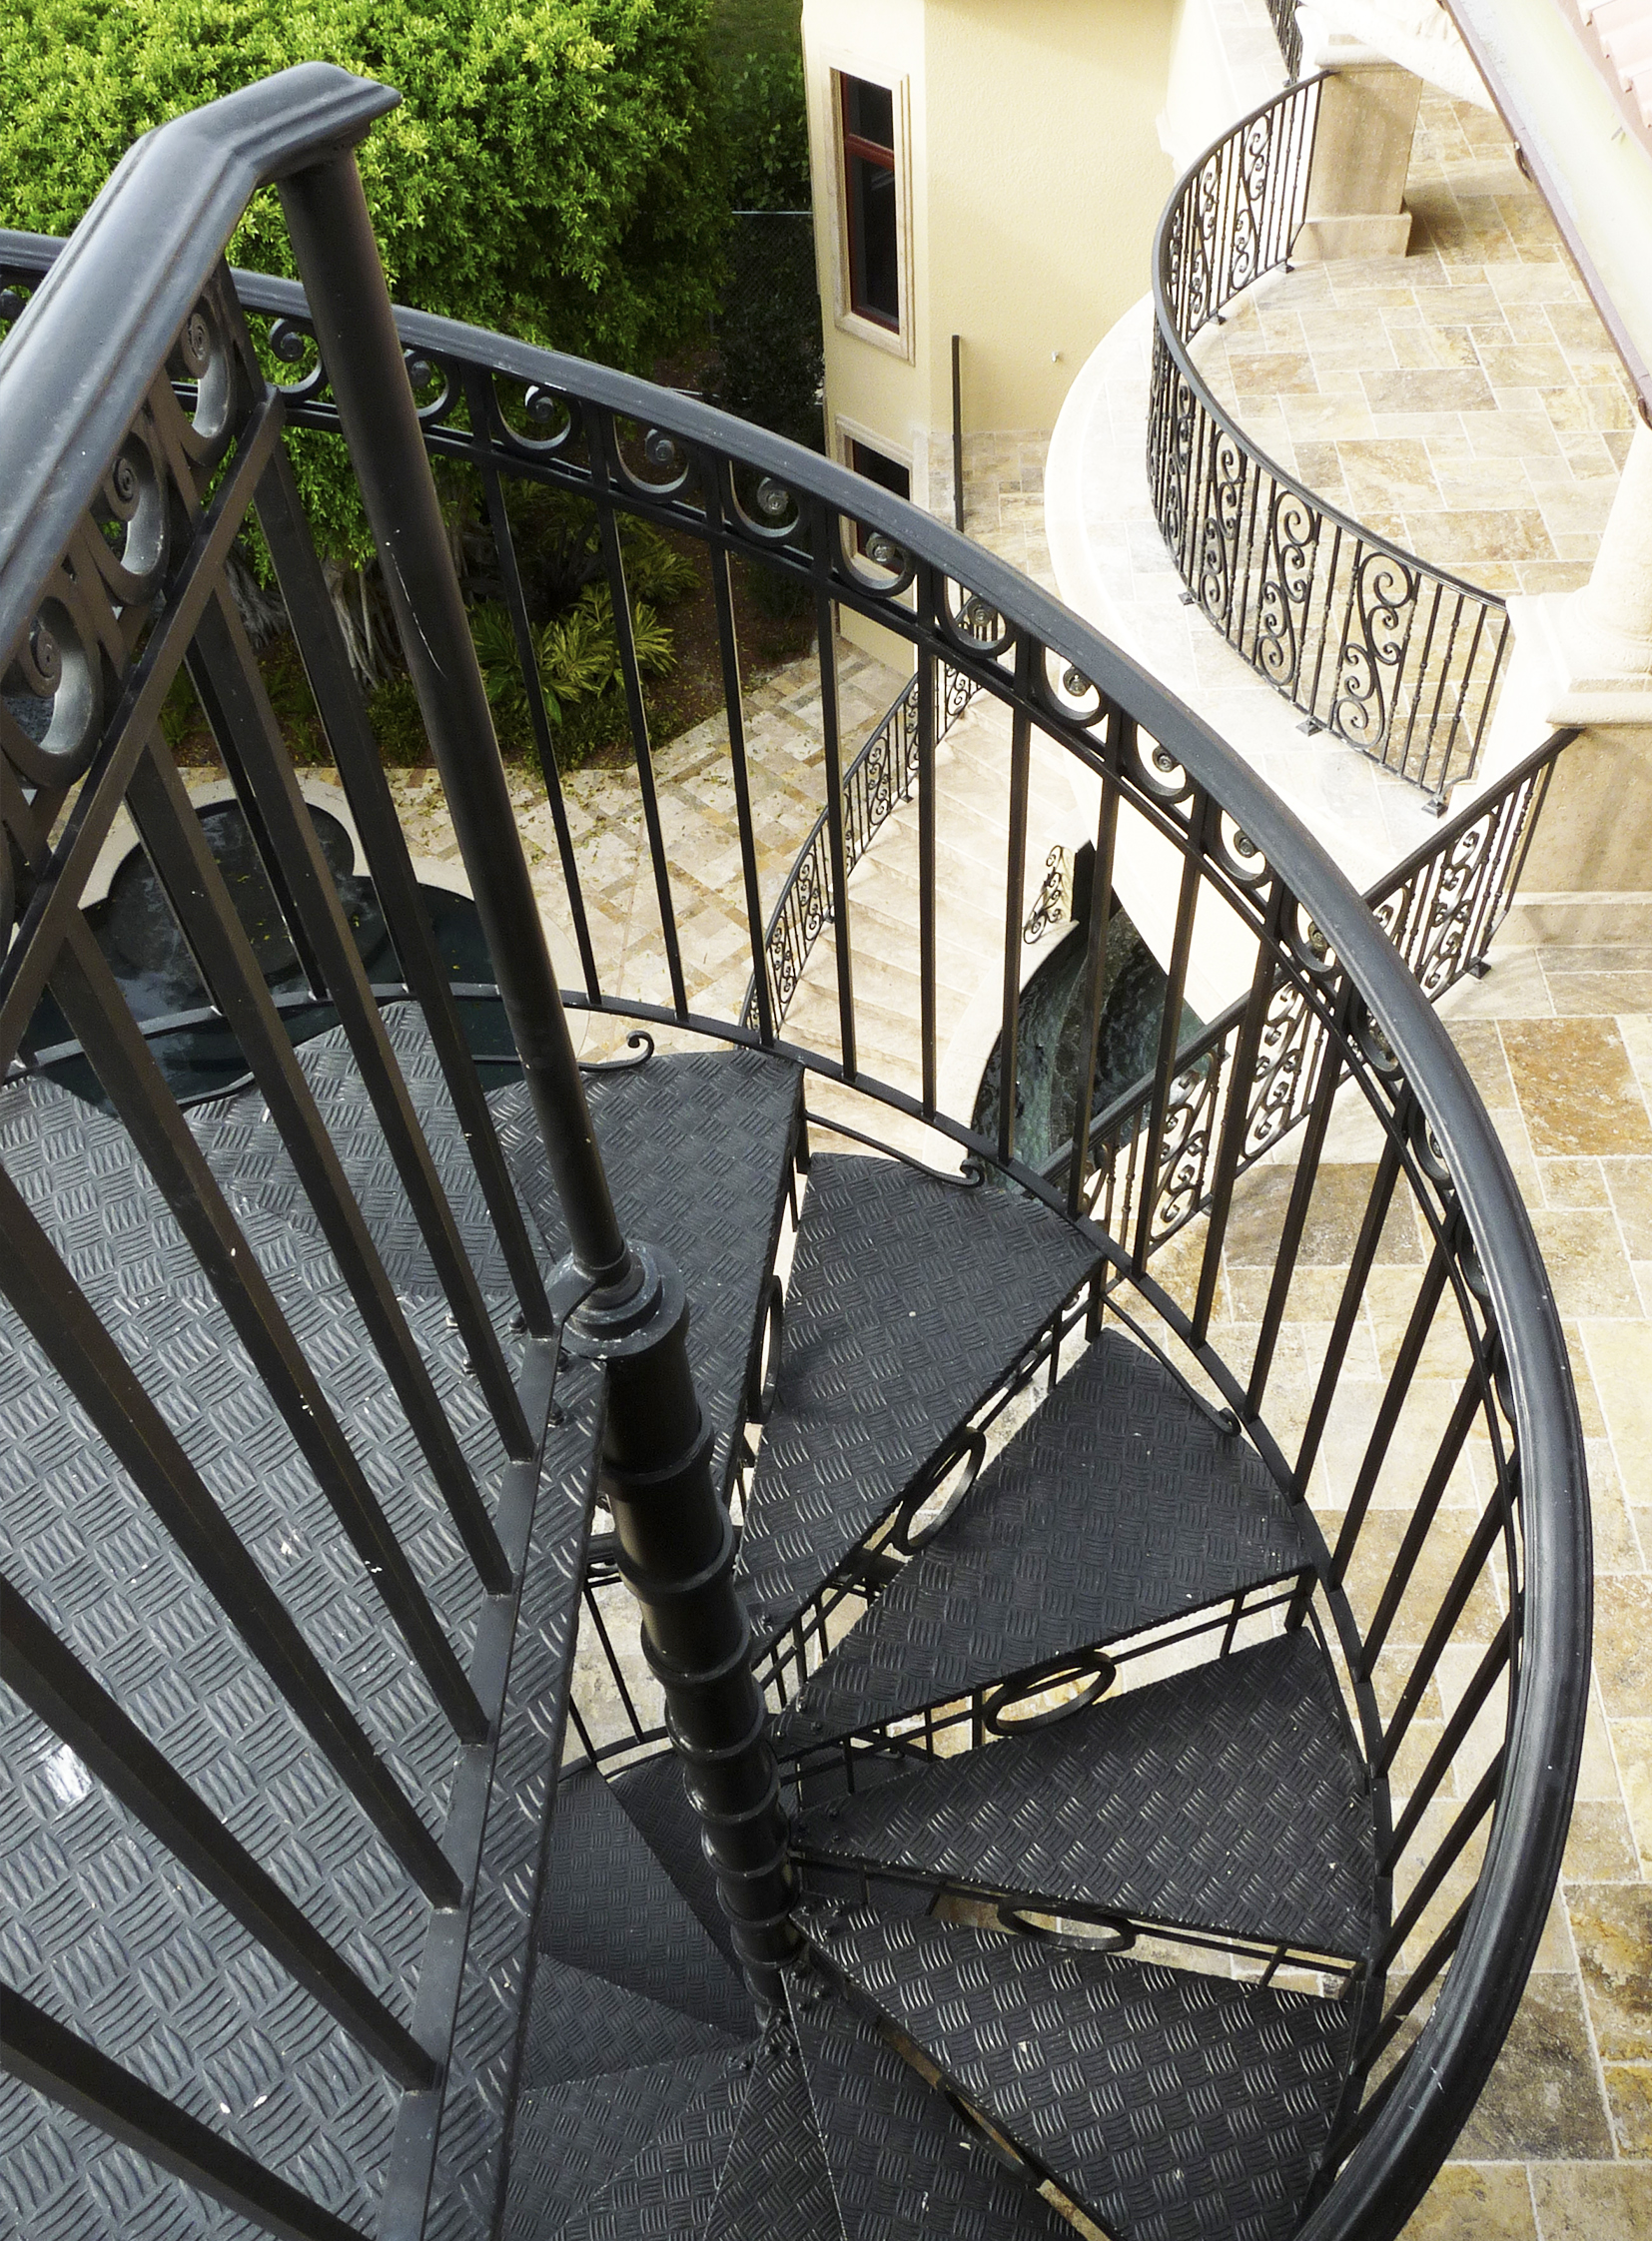 The Spiral Stair Attraction 6 - Belt Atelier